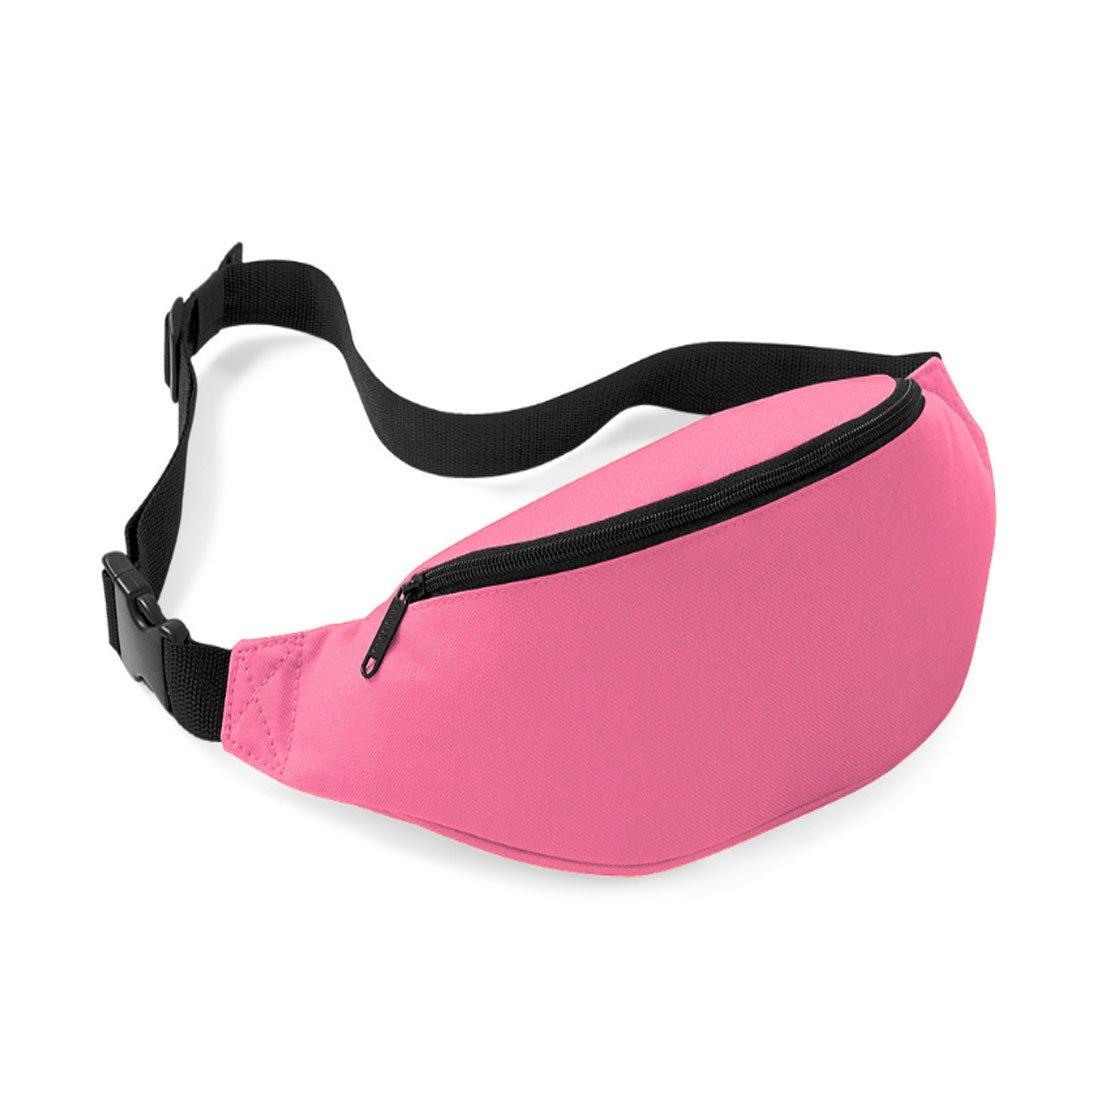 Unisex Men Women Fashion Sporty Multi-purpose 2-Zipper Waist Belt Bag Fanny Pack Adjustable Strap for Sport Hiking Traveling Passport Wallet (Pink) InnoLife